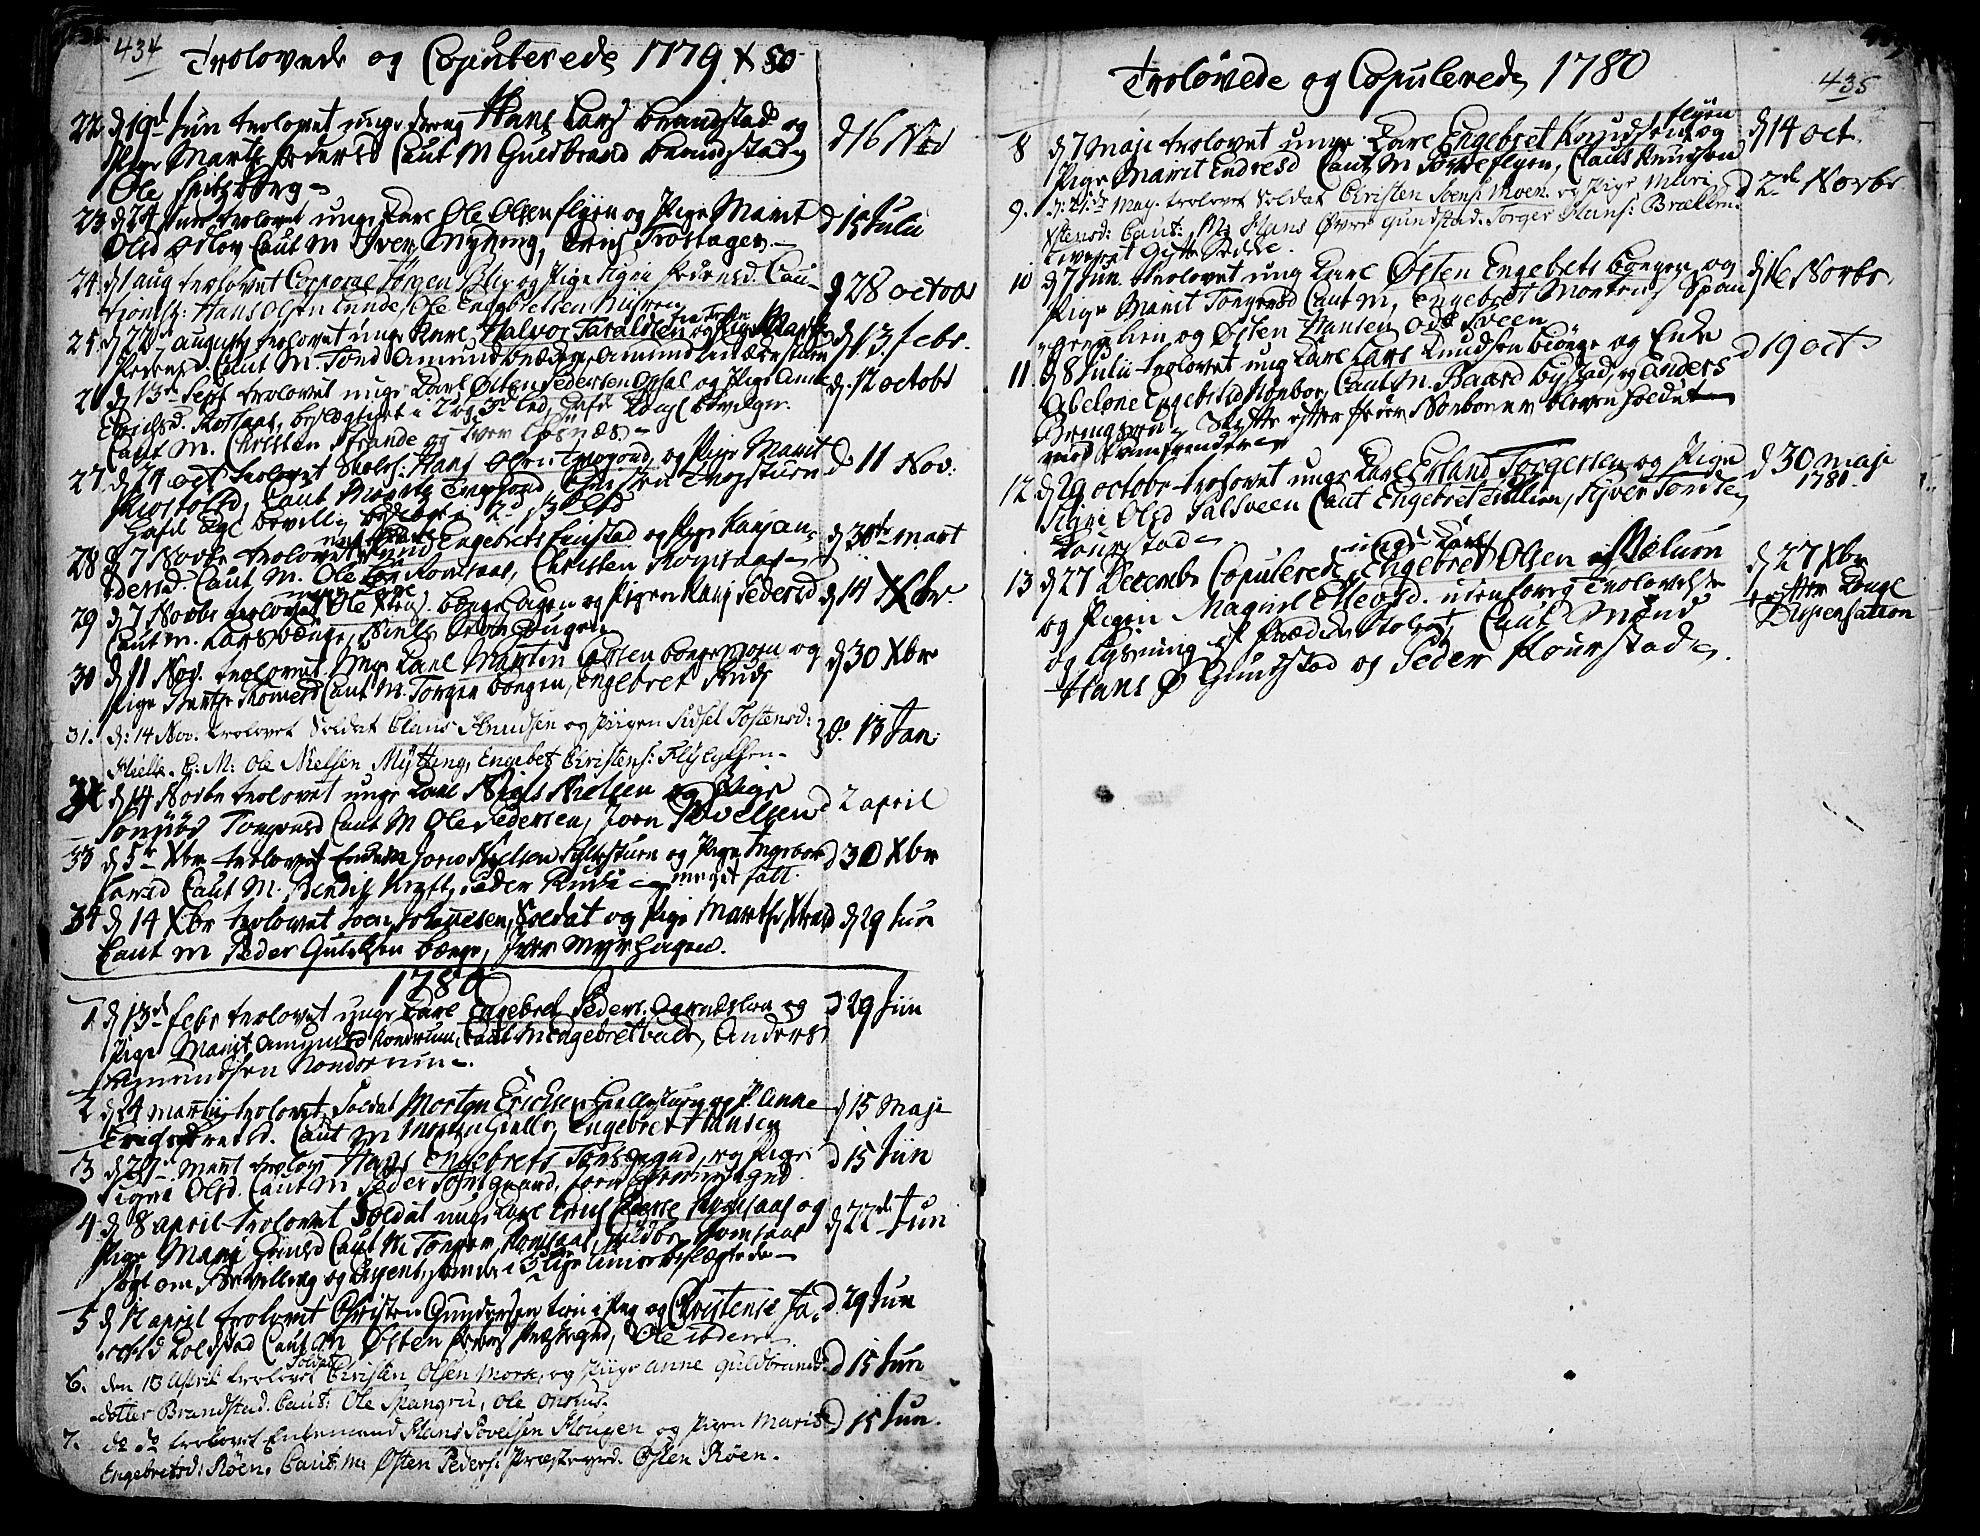 SAH, Ringebu prestekontor, Ministerialbok nr. 2, 1734-1780, s. 434-435